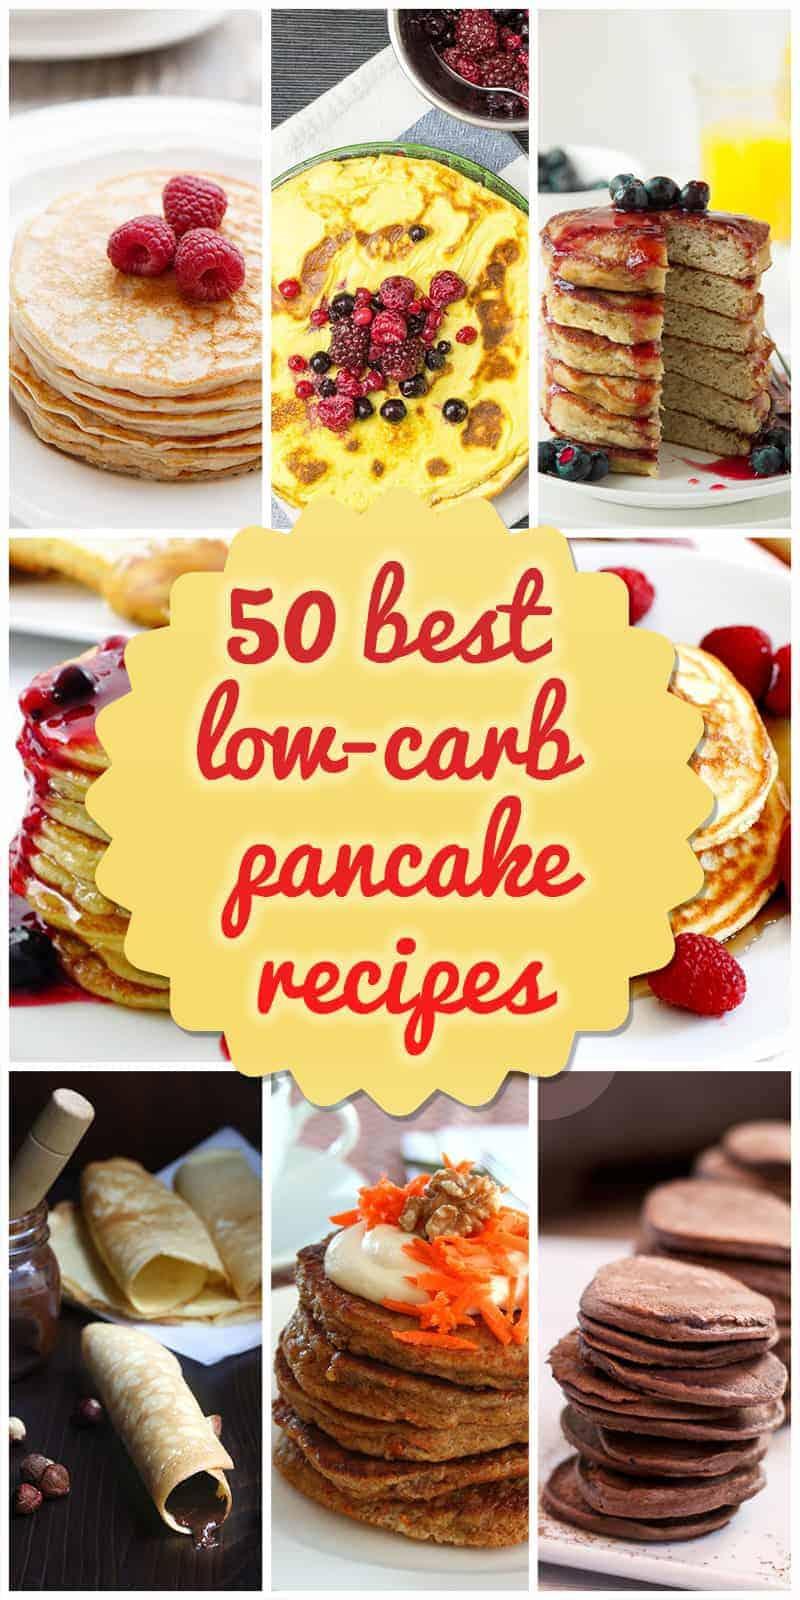 best low-carb pancake recipe ideas